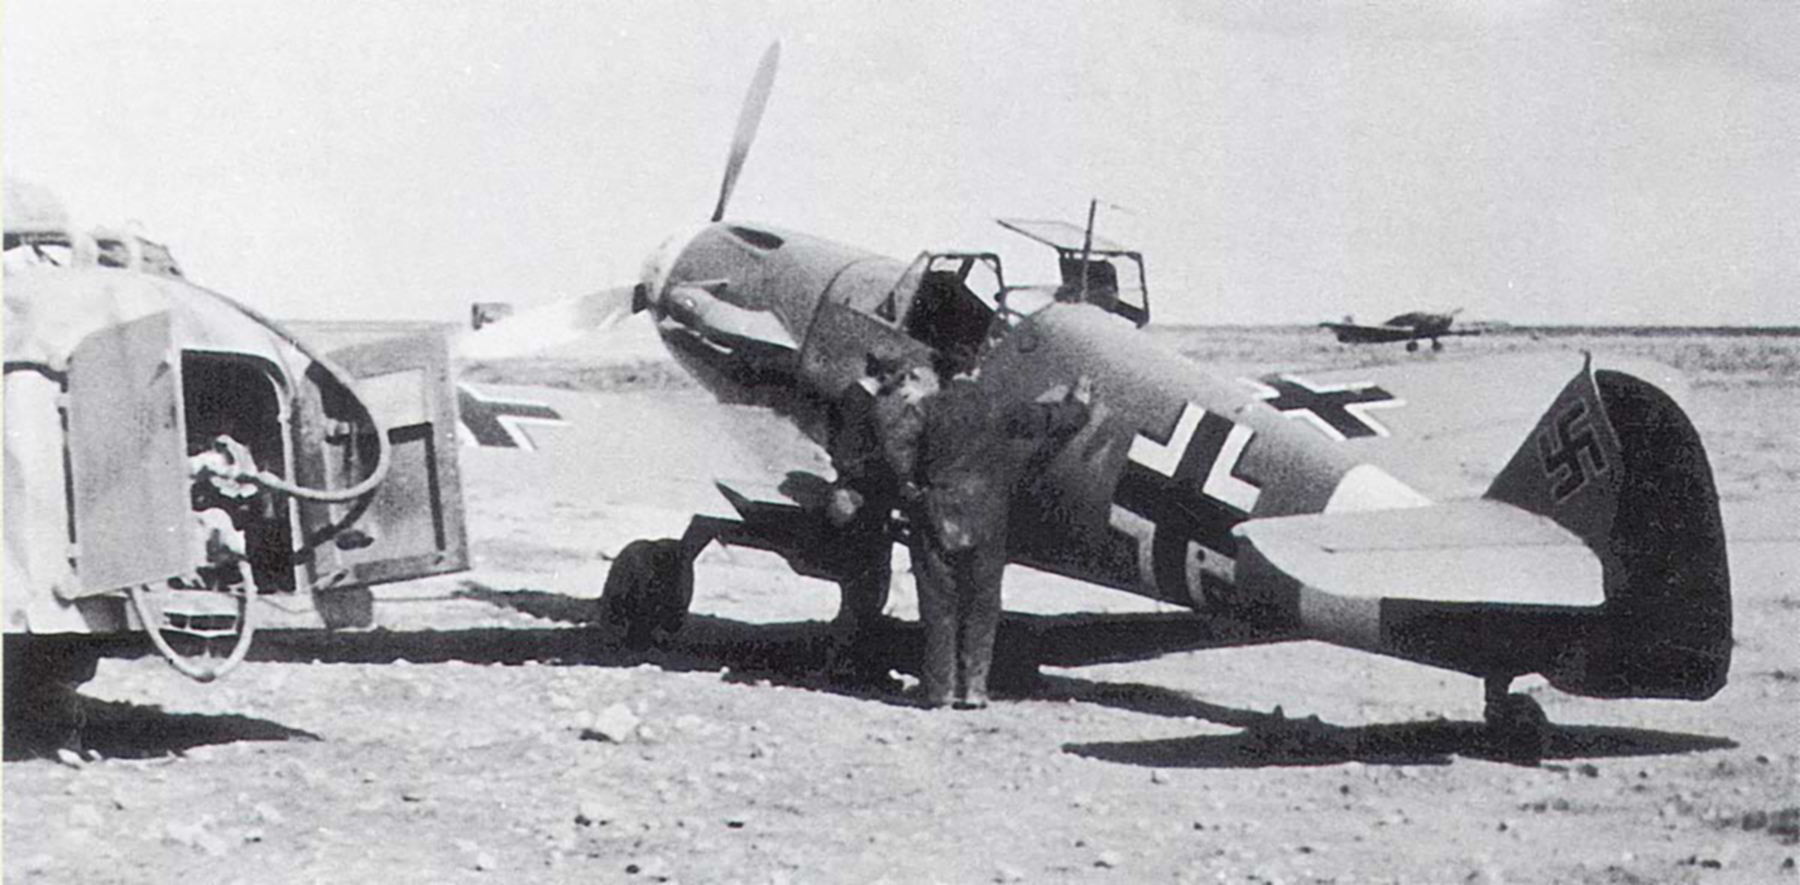 Messerschmitt Bf 109F4Trop Stab III.JG27 Yellow 14 Hans Joachim Marseille WNr 8693 Martuba Feb 1942 02